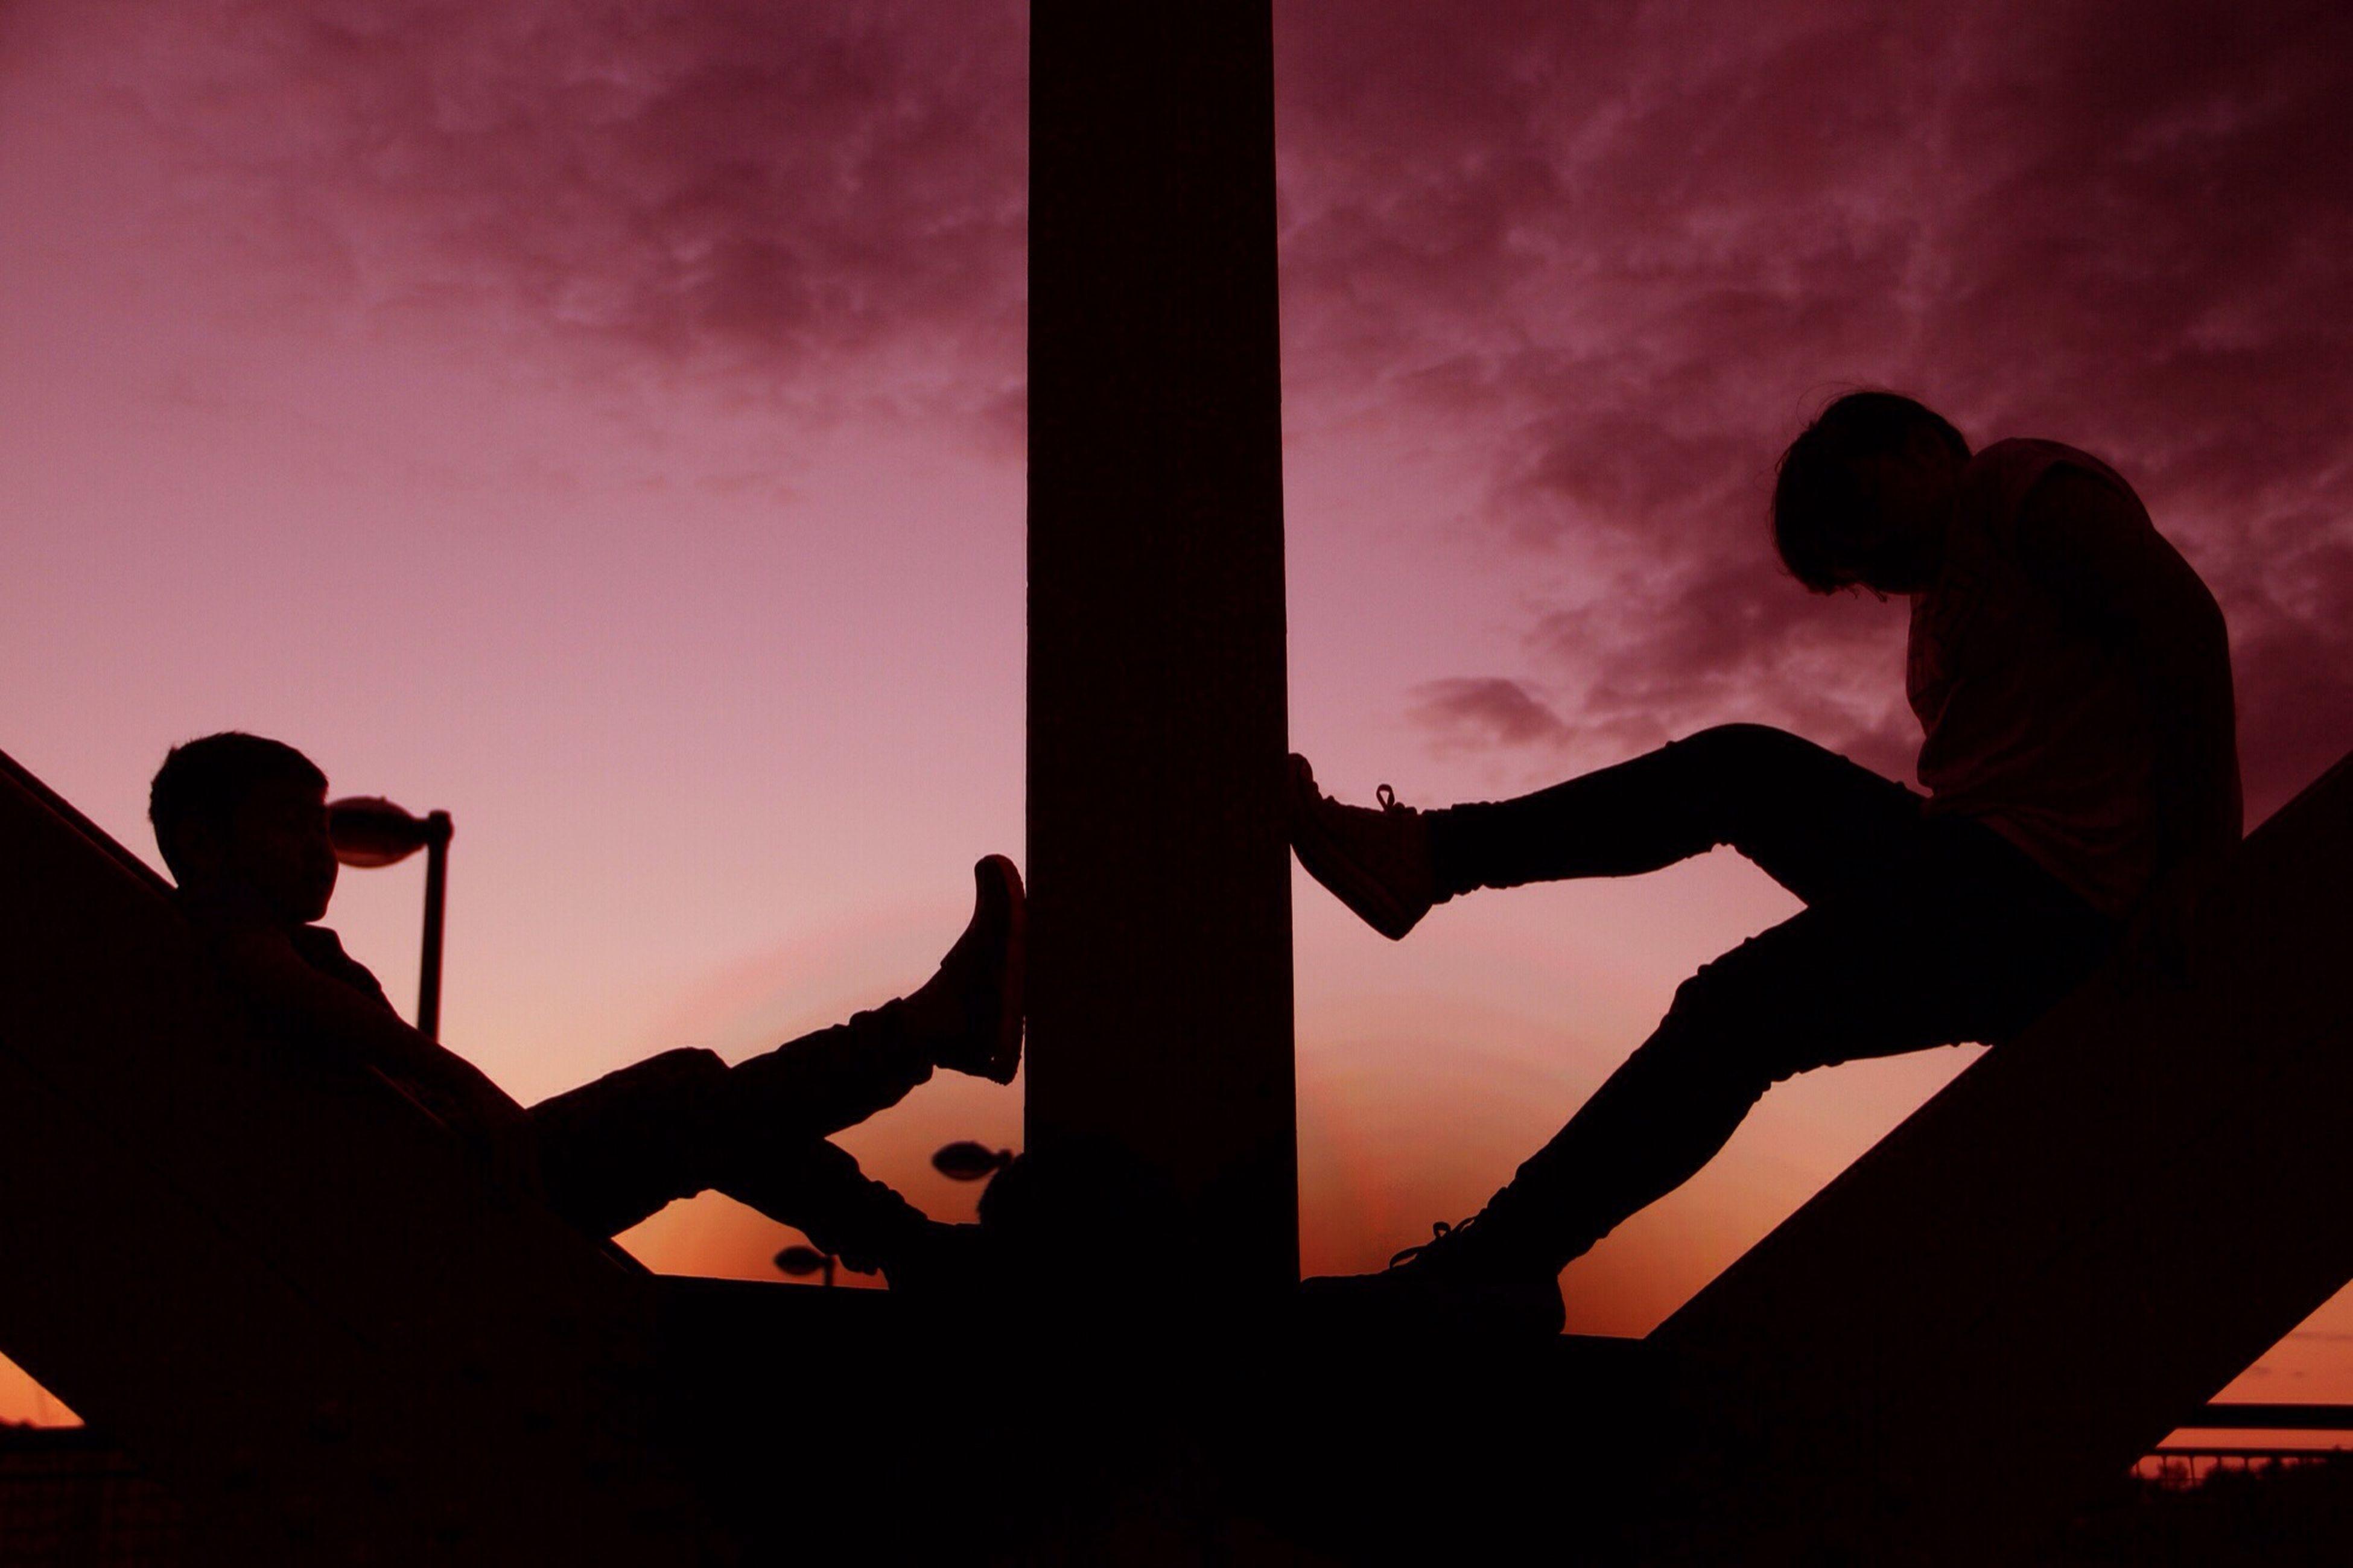 silhouette, sky, sunset, cloud - sky, low angle view, lifestyles, leisure activity, men, standing, cloud, cloudy, orange color, three quarter length, outline, dusk, person, dramatic sky